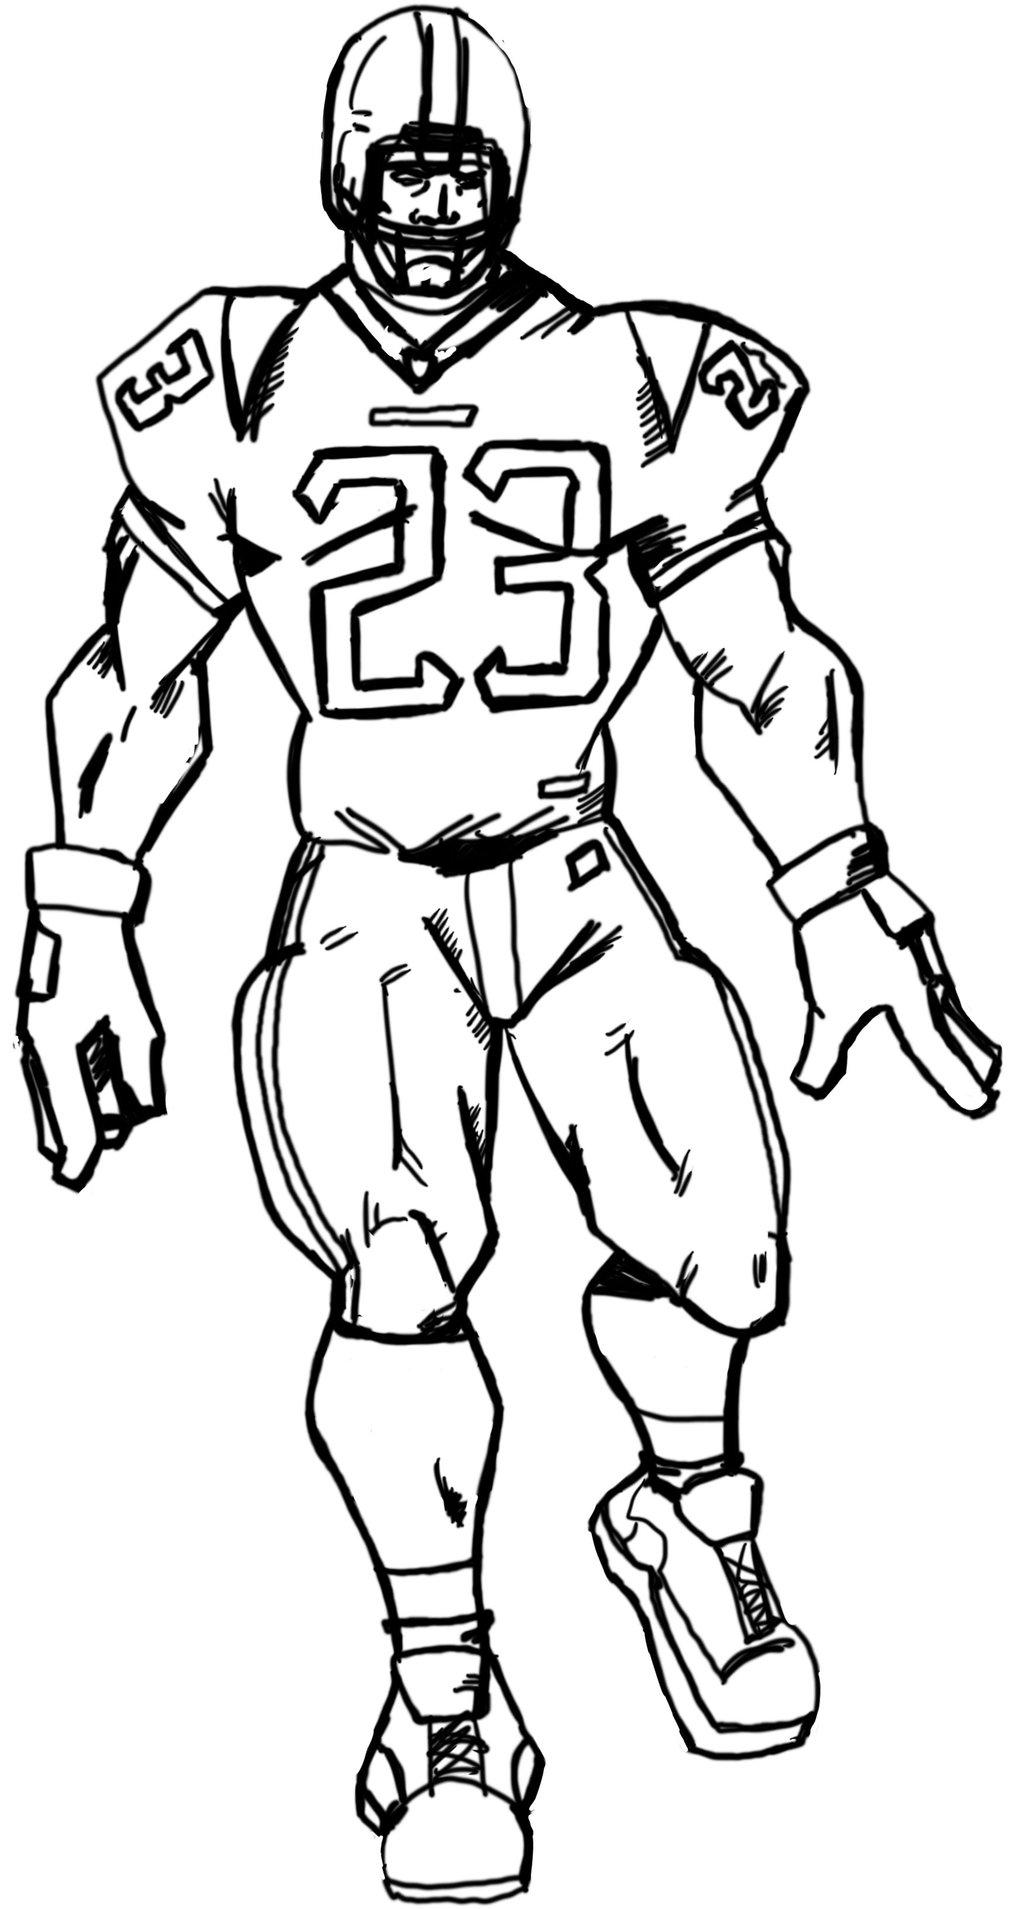 1024x1909 Nfl Football Player Drawing